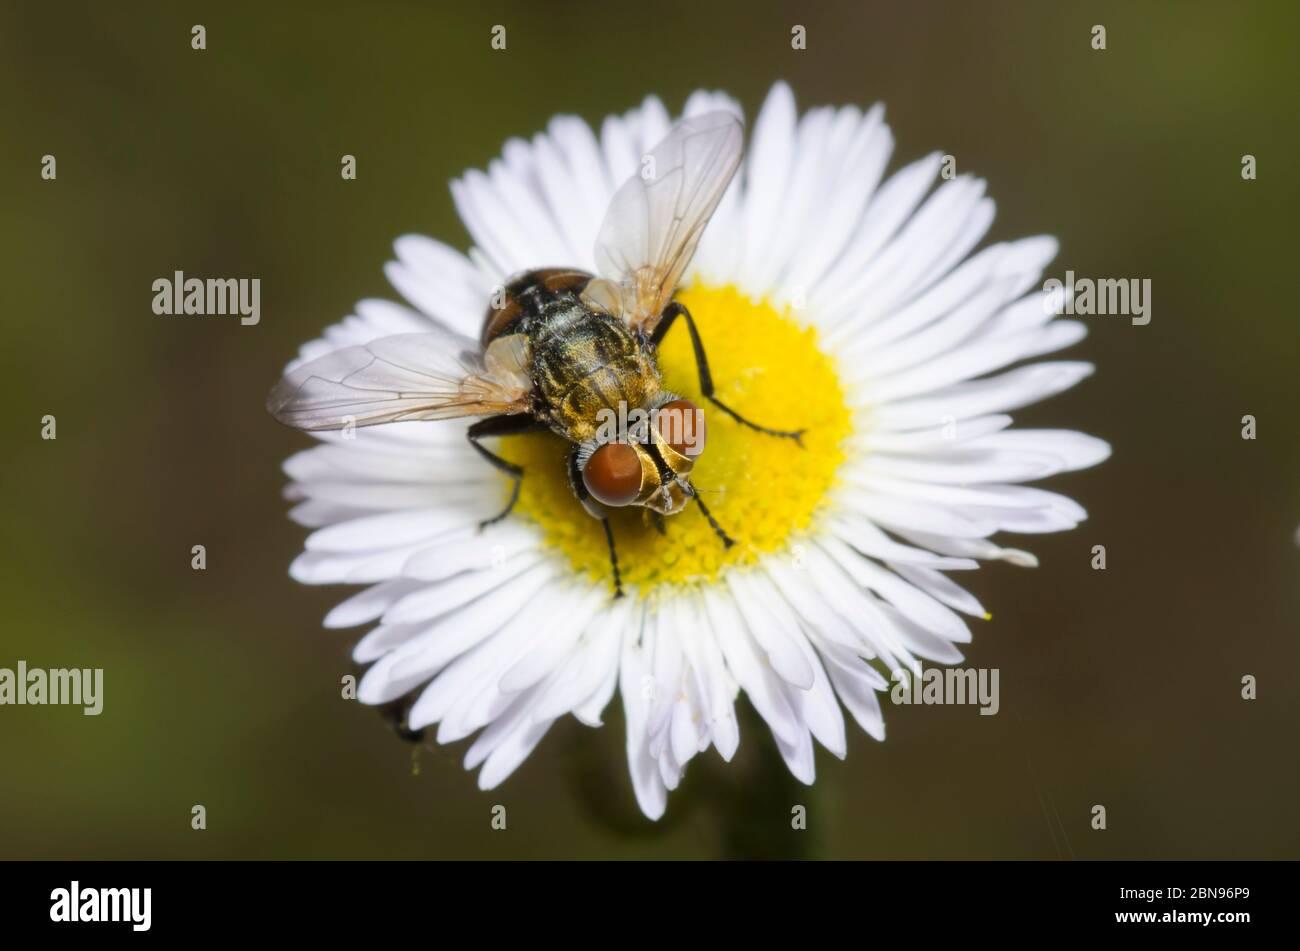 Tachinid Fly, Gymnoclytia sp., foraging on Fleabane, Erigeron sp. Stock Photo